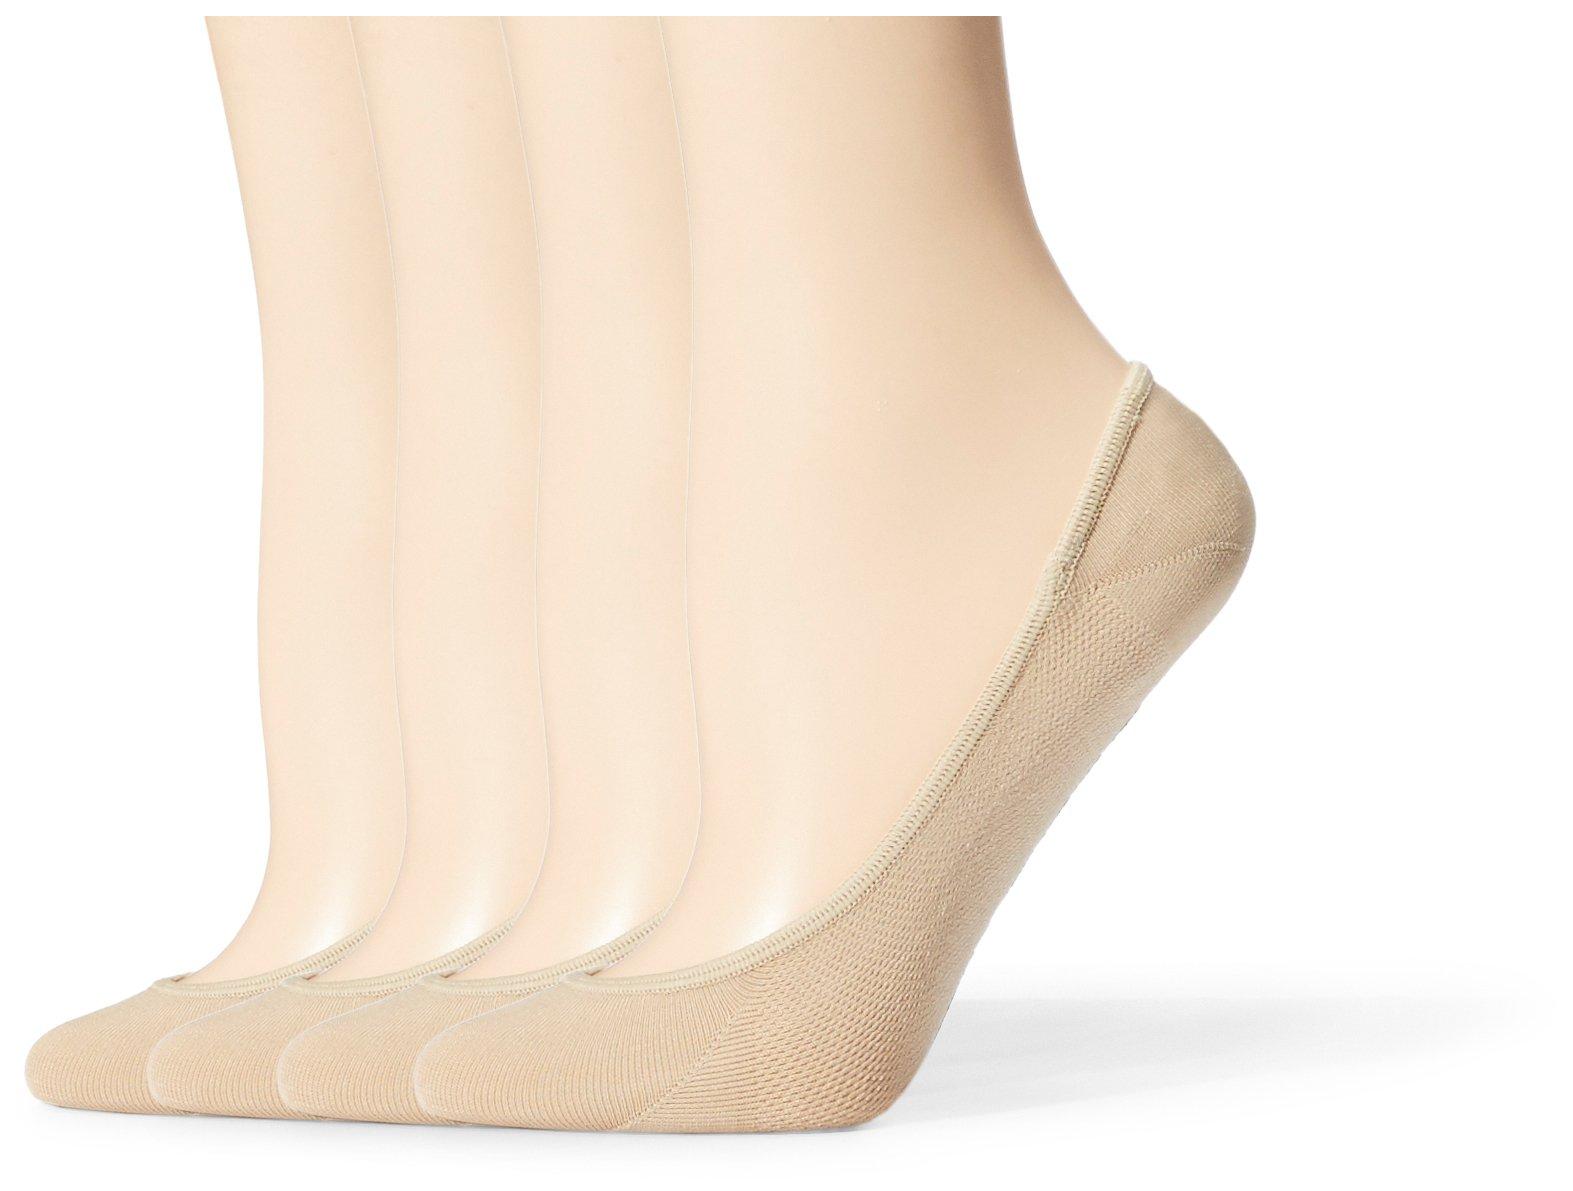 Starter Women's 4-Pack Microfiber Invisible Liner Socks, Prime Exclusive, Beige, Medium (Shoe Size 5-9.5)